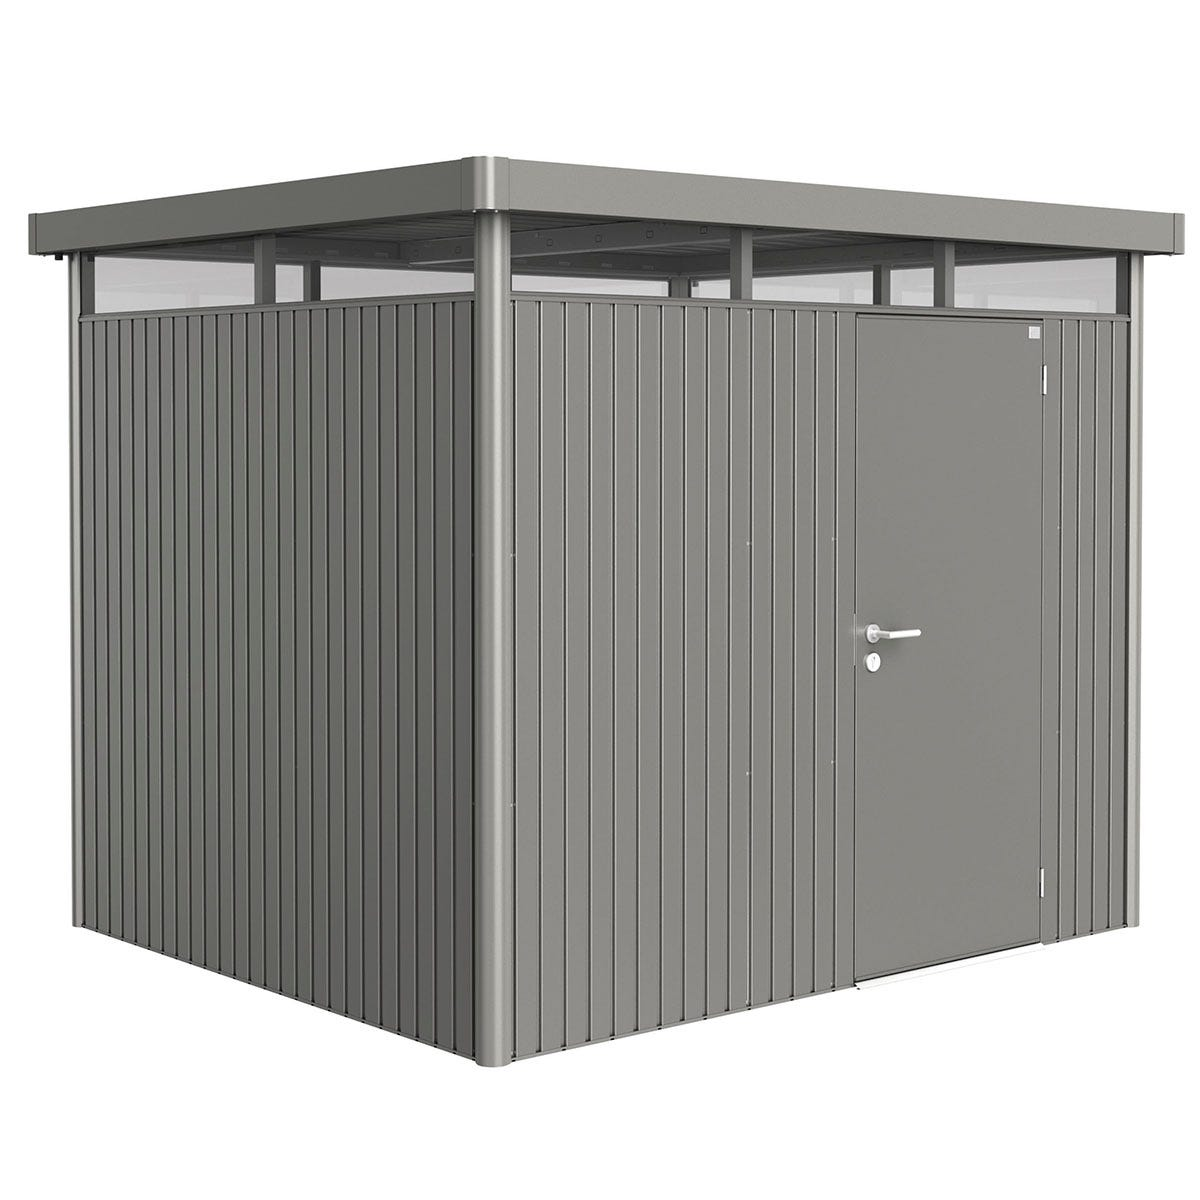 Biohort Highline Metal Shed H3 Standard door 9 x 8 - Quartz Grey